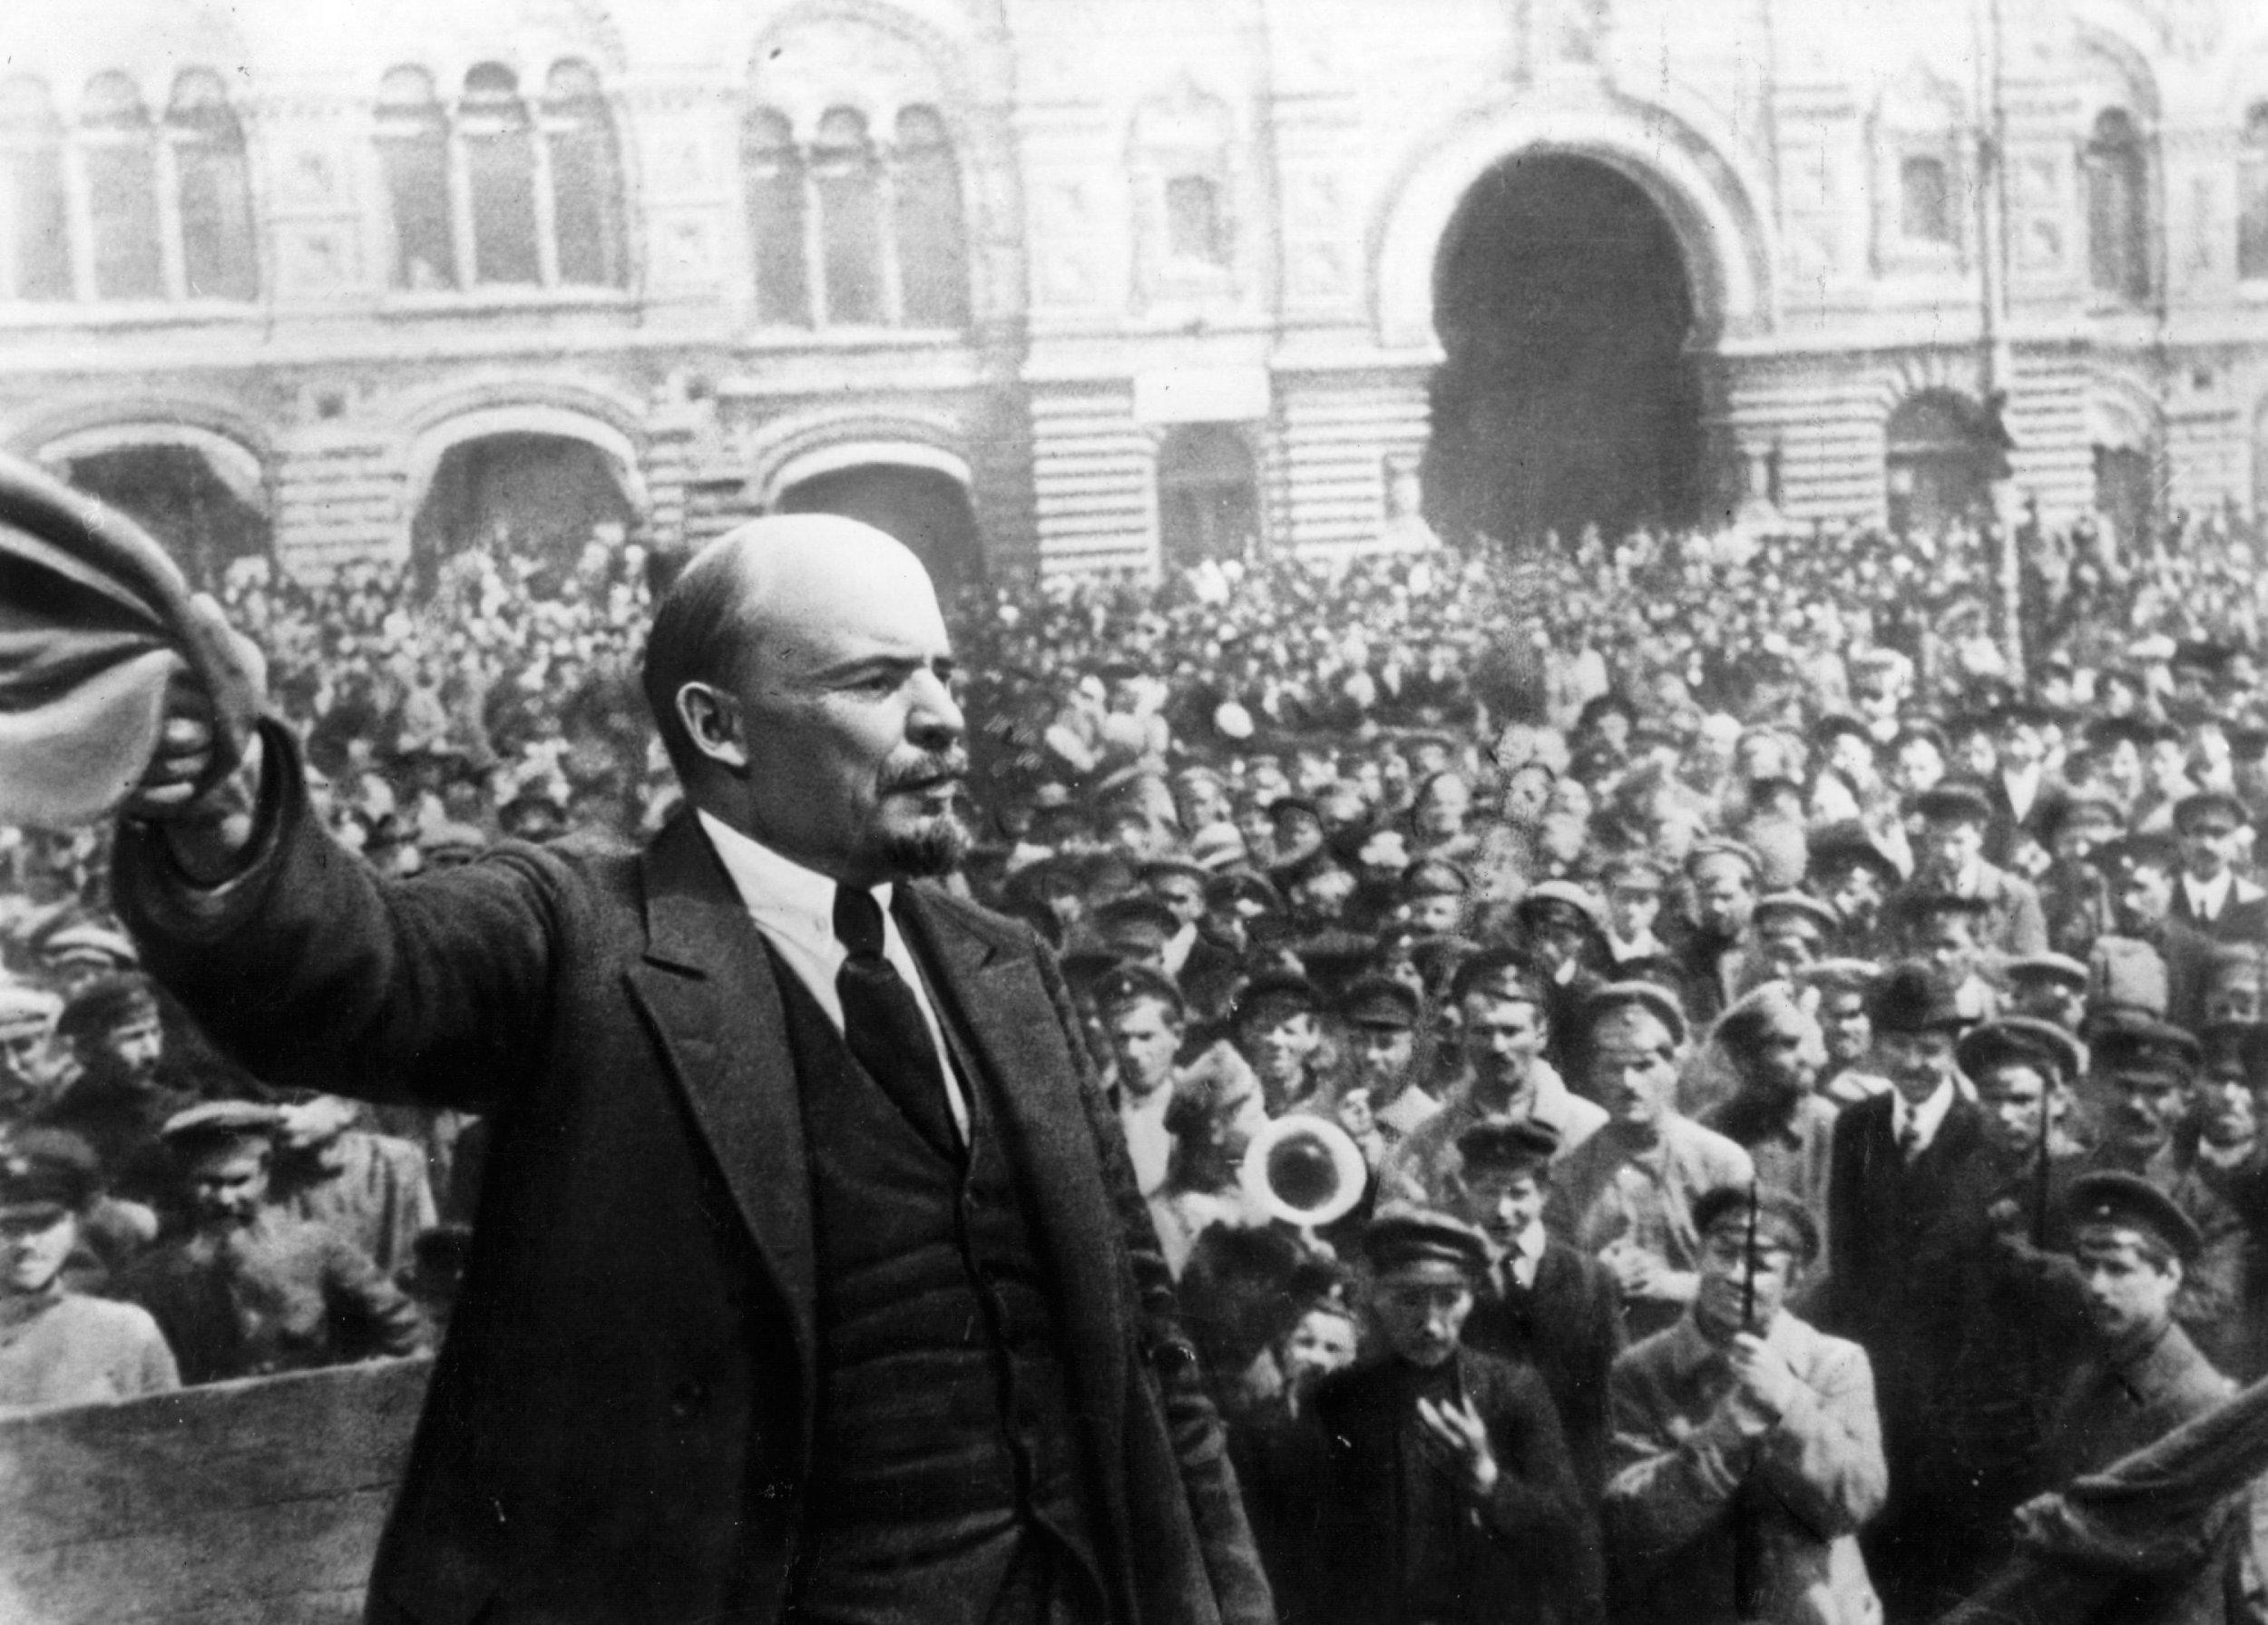 20th-century international relations